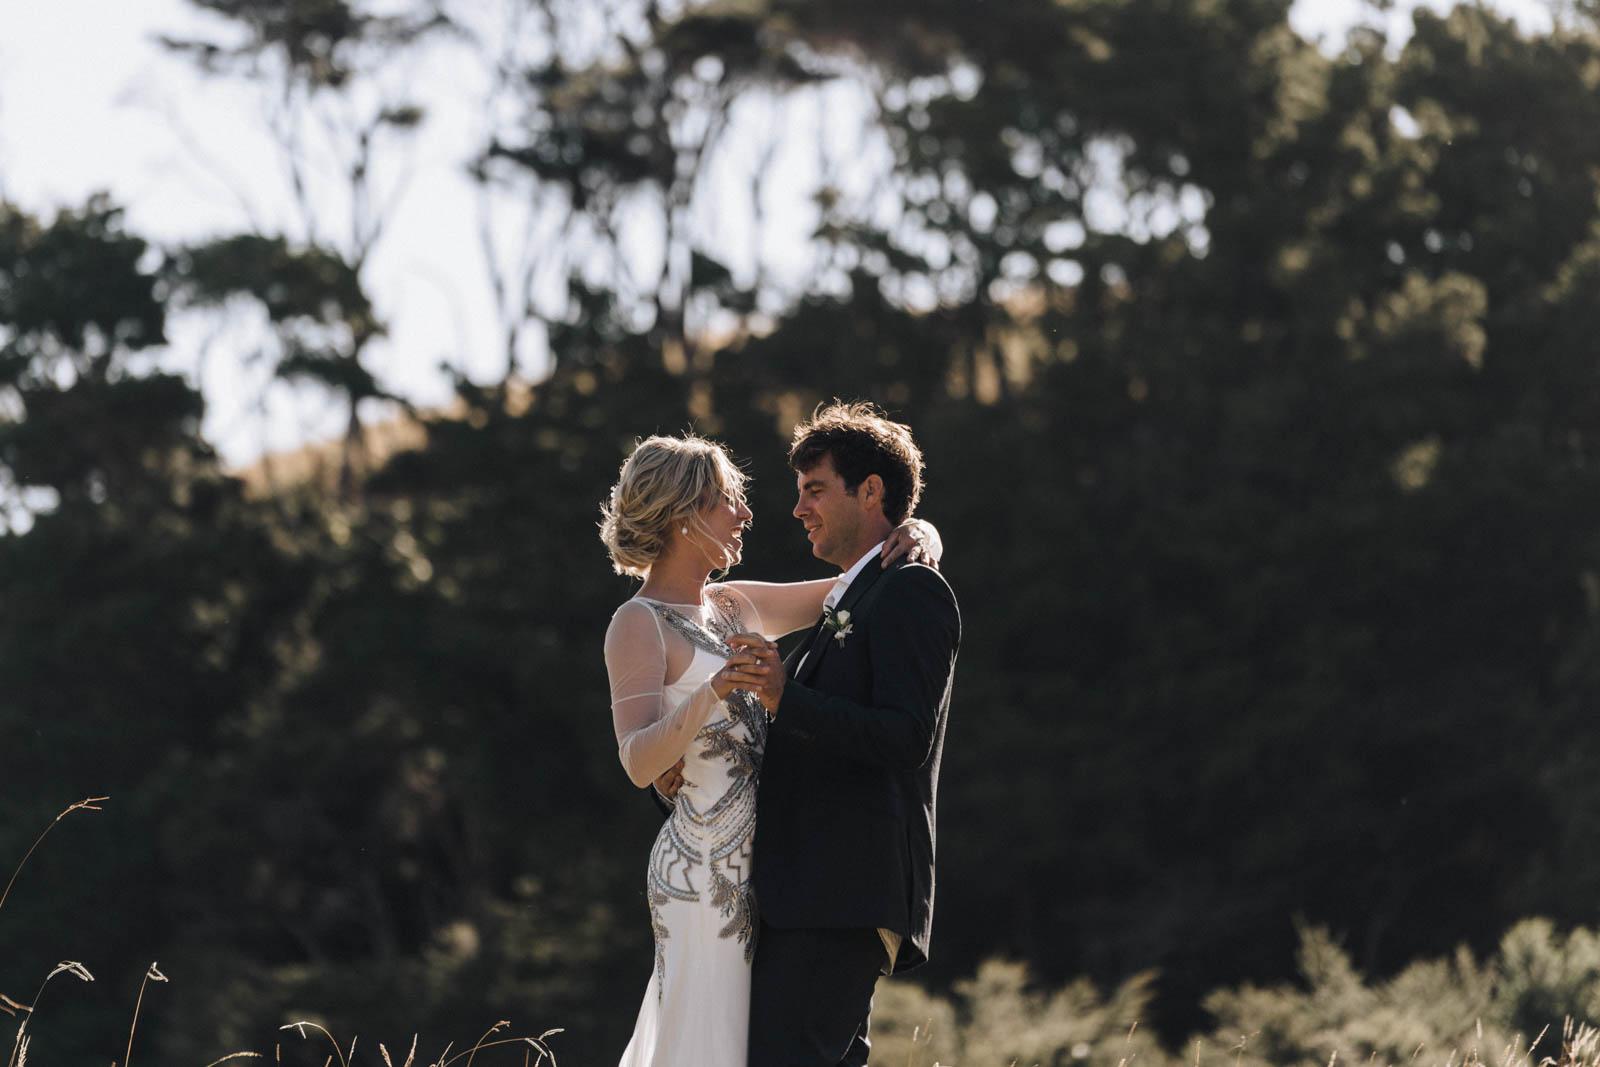 newfound-l-i-coromandel-wedding-photographer-1734-A9_03861